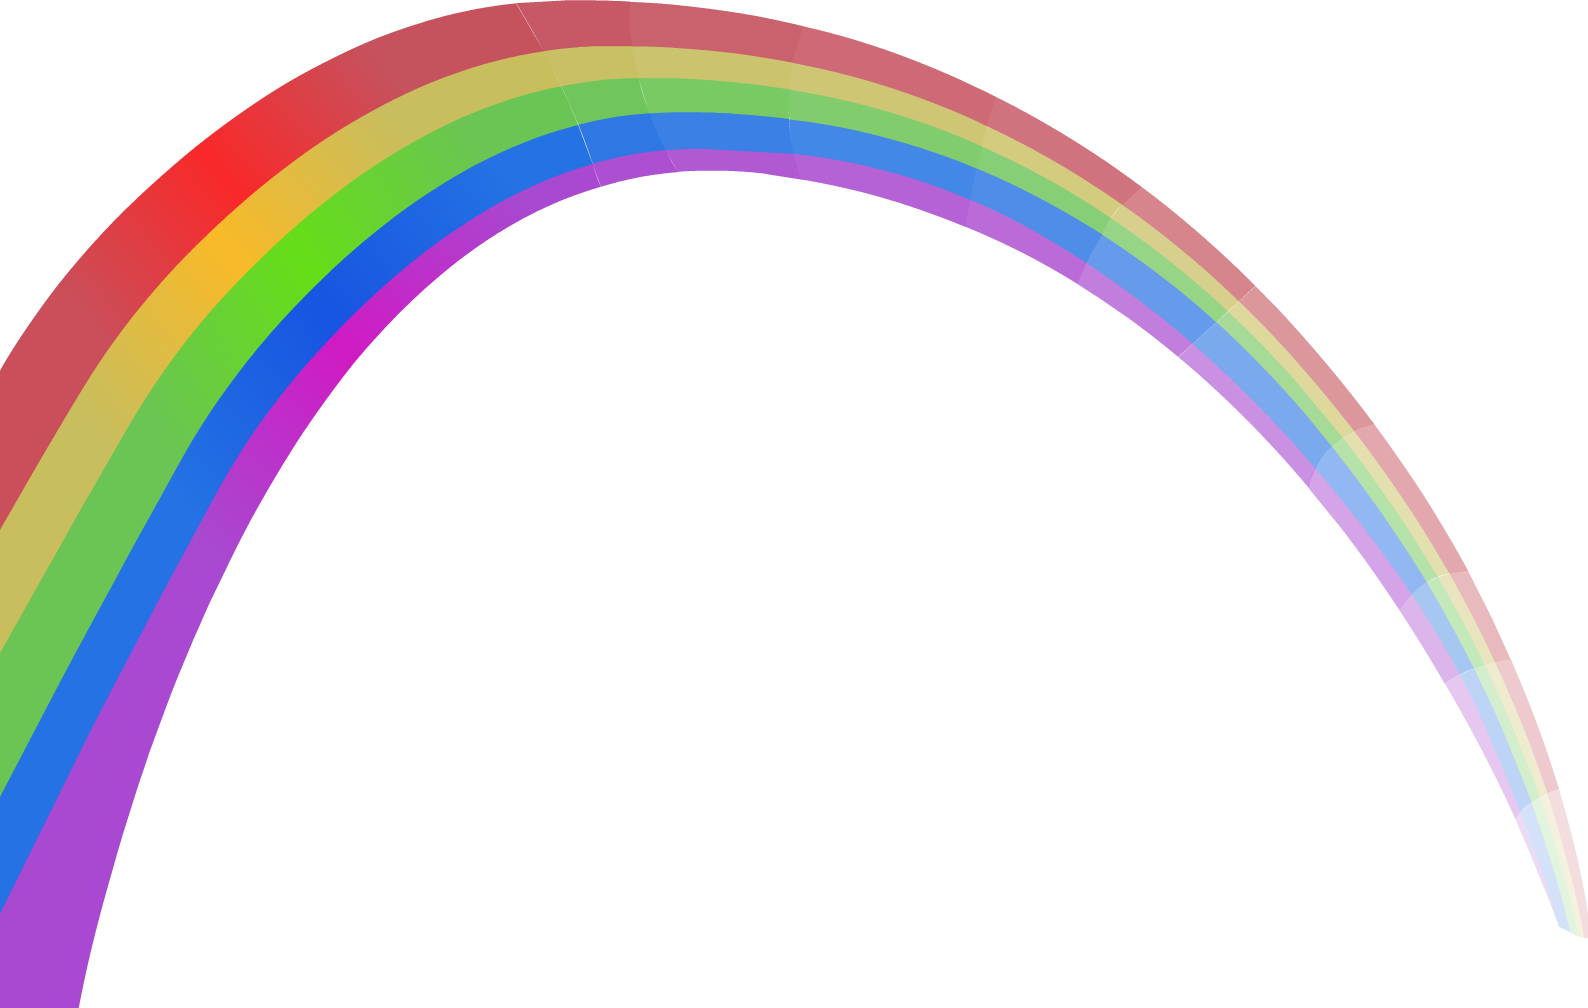 Rainbow PNG - 17676